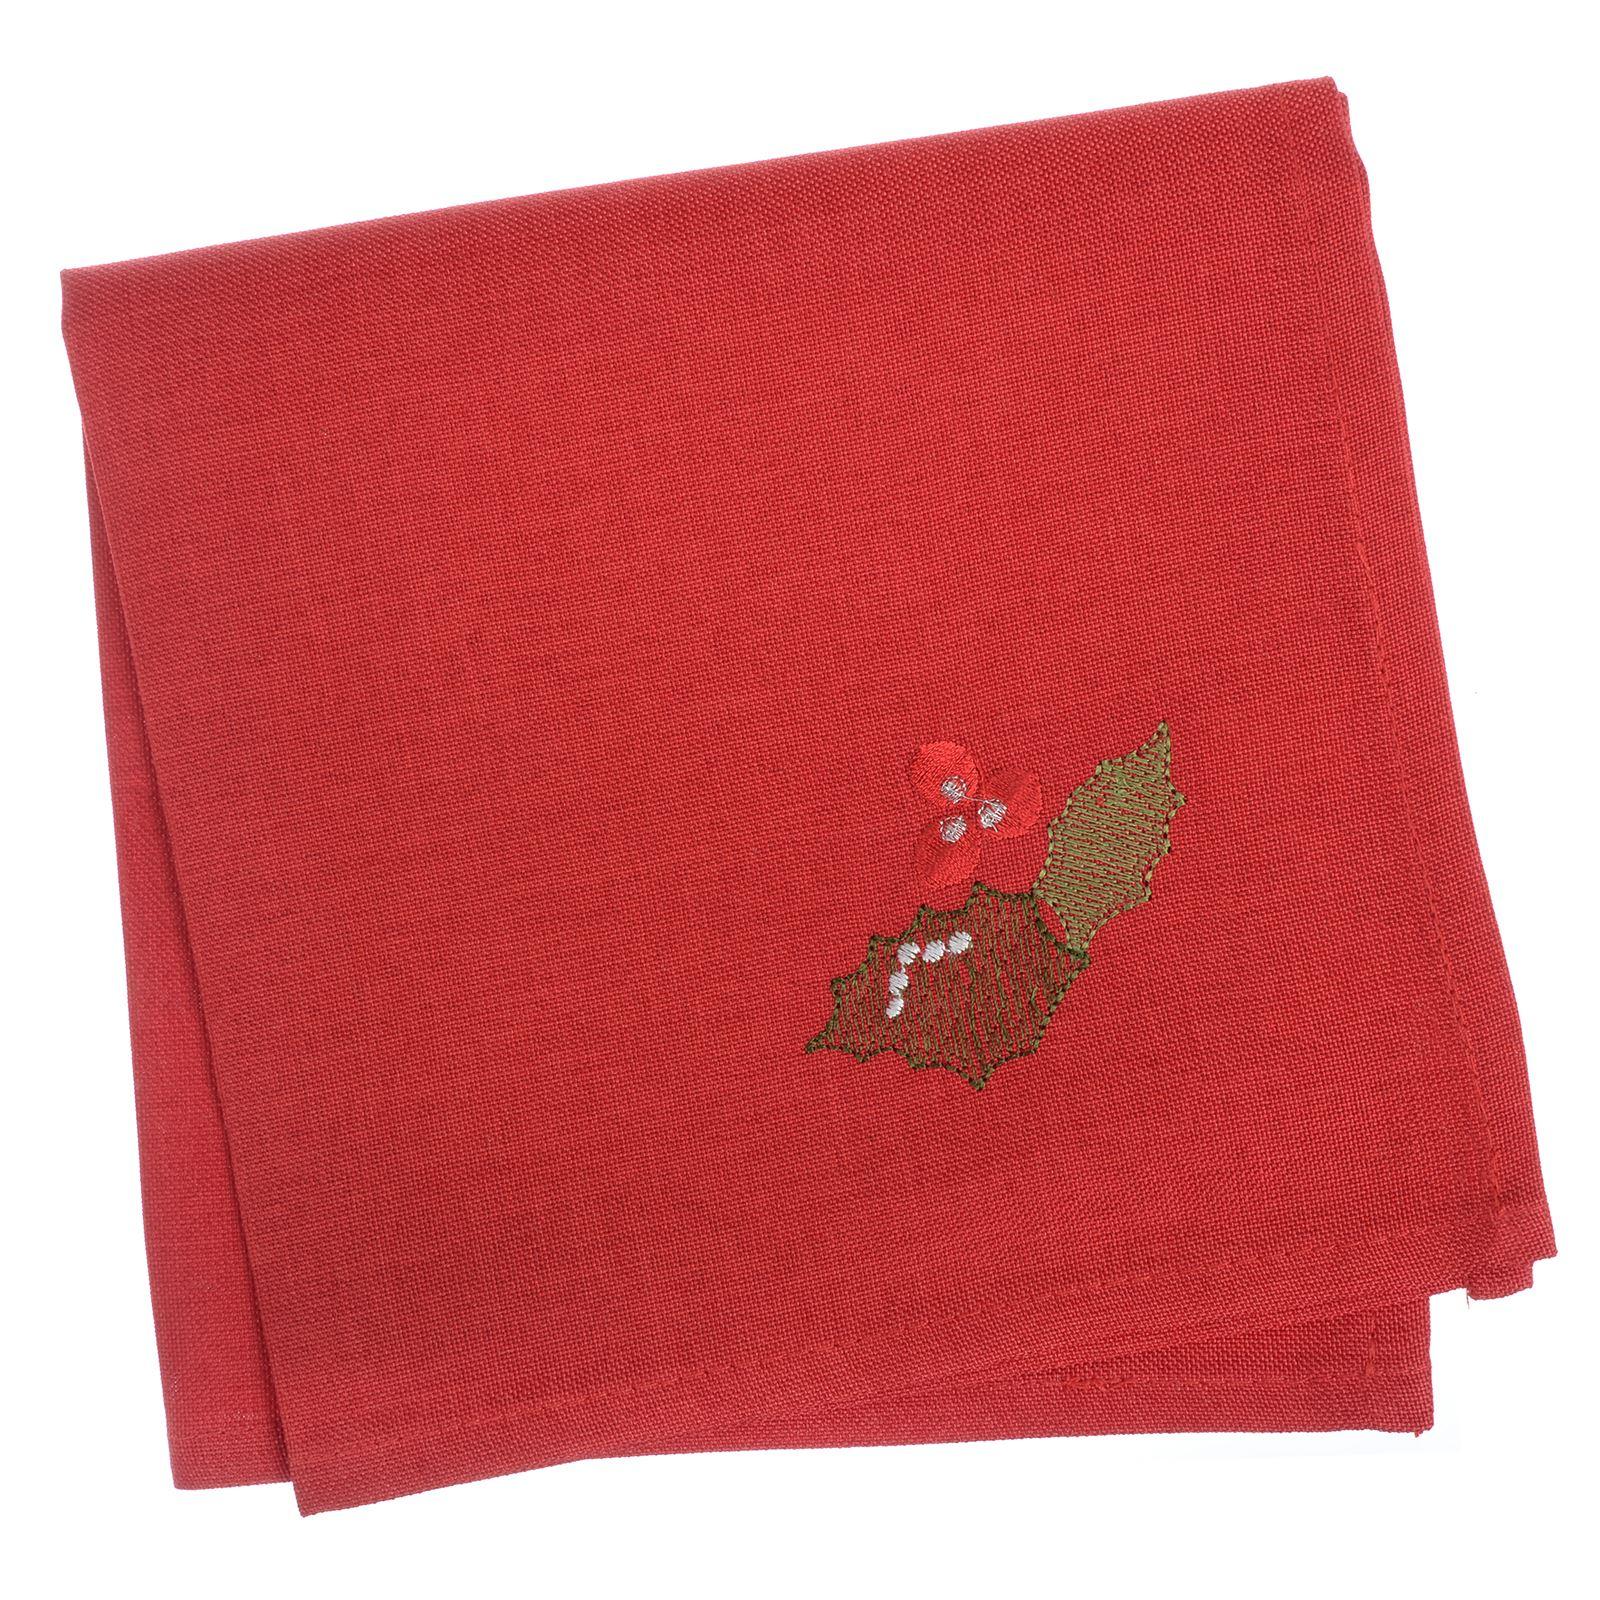 Christmas-Tablecloth-Festive-Pattern-Rectangle-Round-Fabric-Xmas-Room-Decoration Indexbild 91